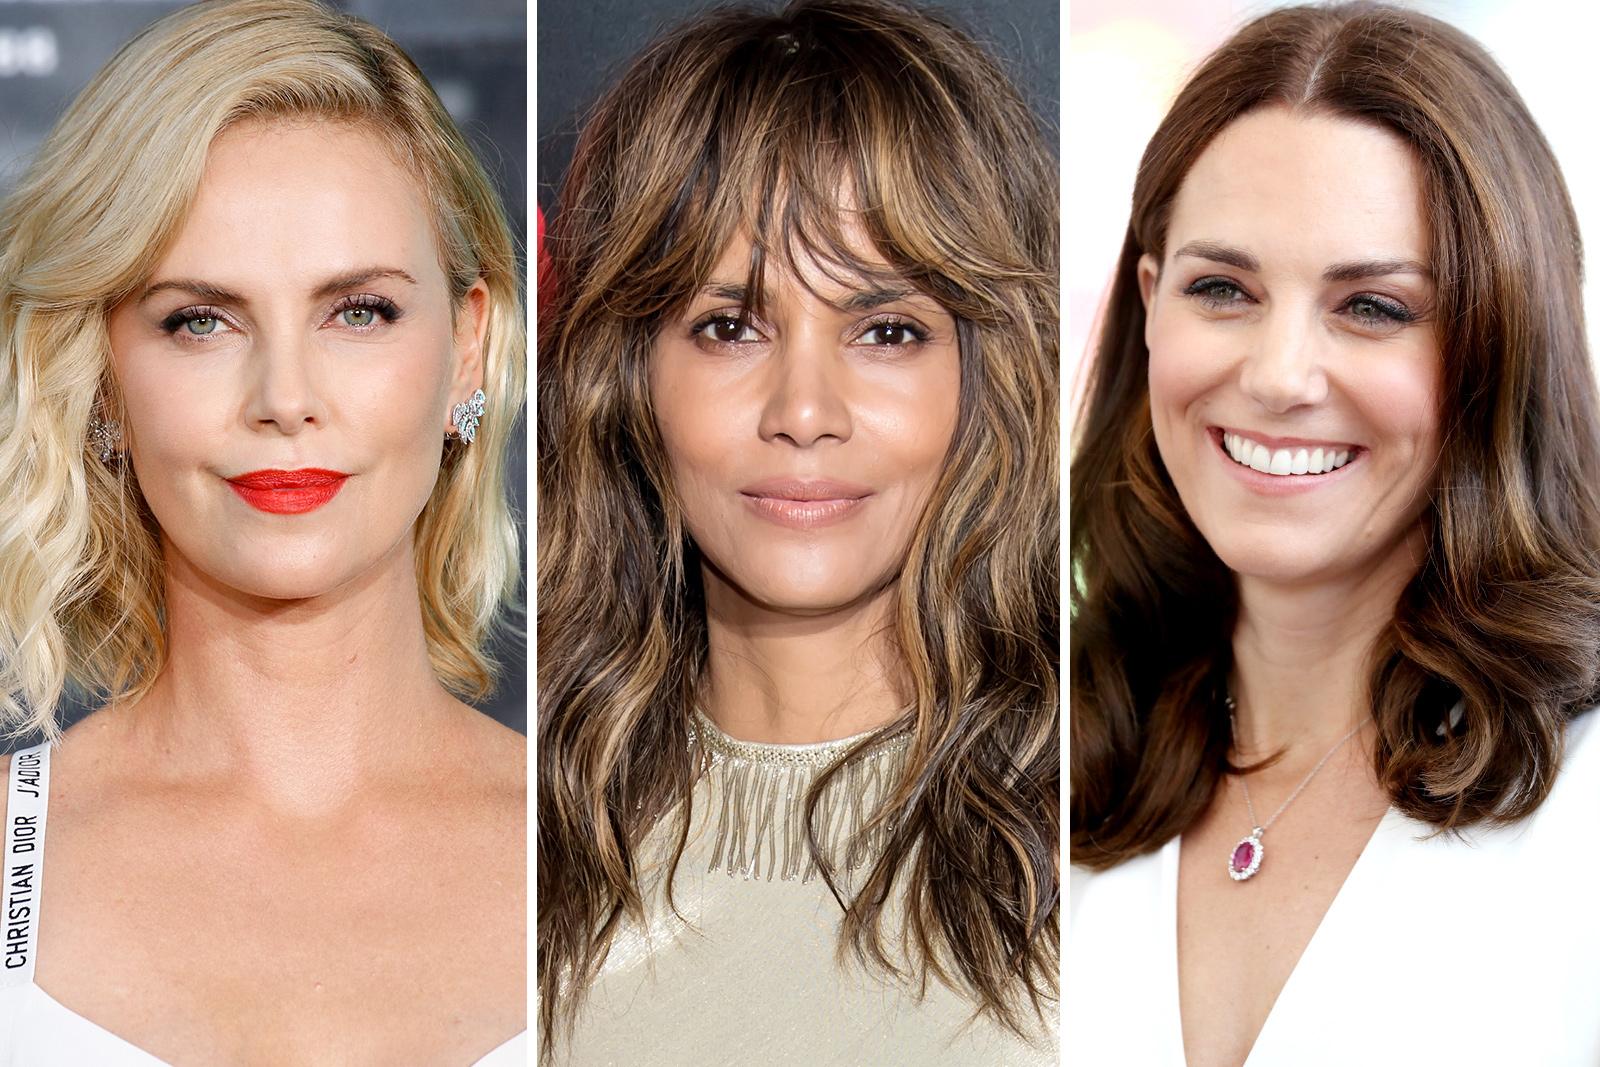 celebridades con forma de rostro ovalada, ideas de cortes de pelo modernos, cortes de pelo mujer segun rostro